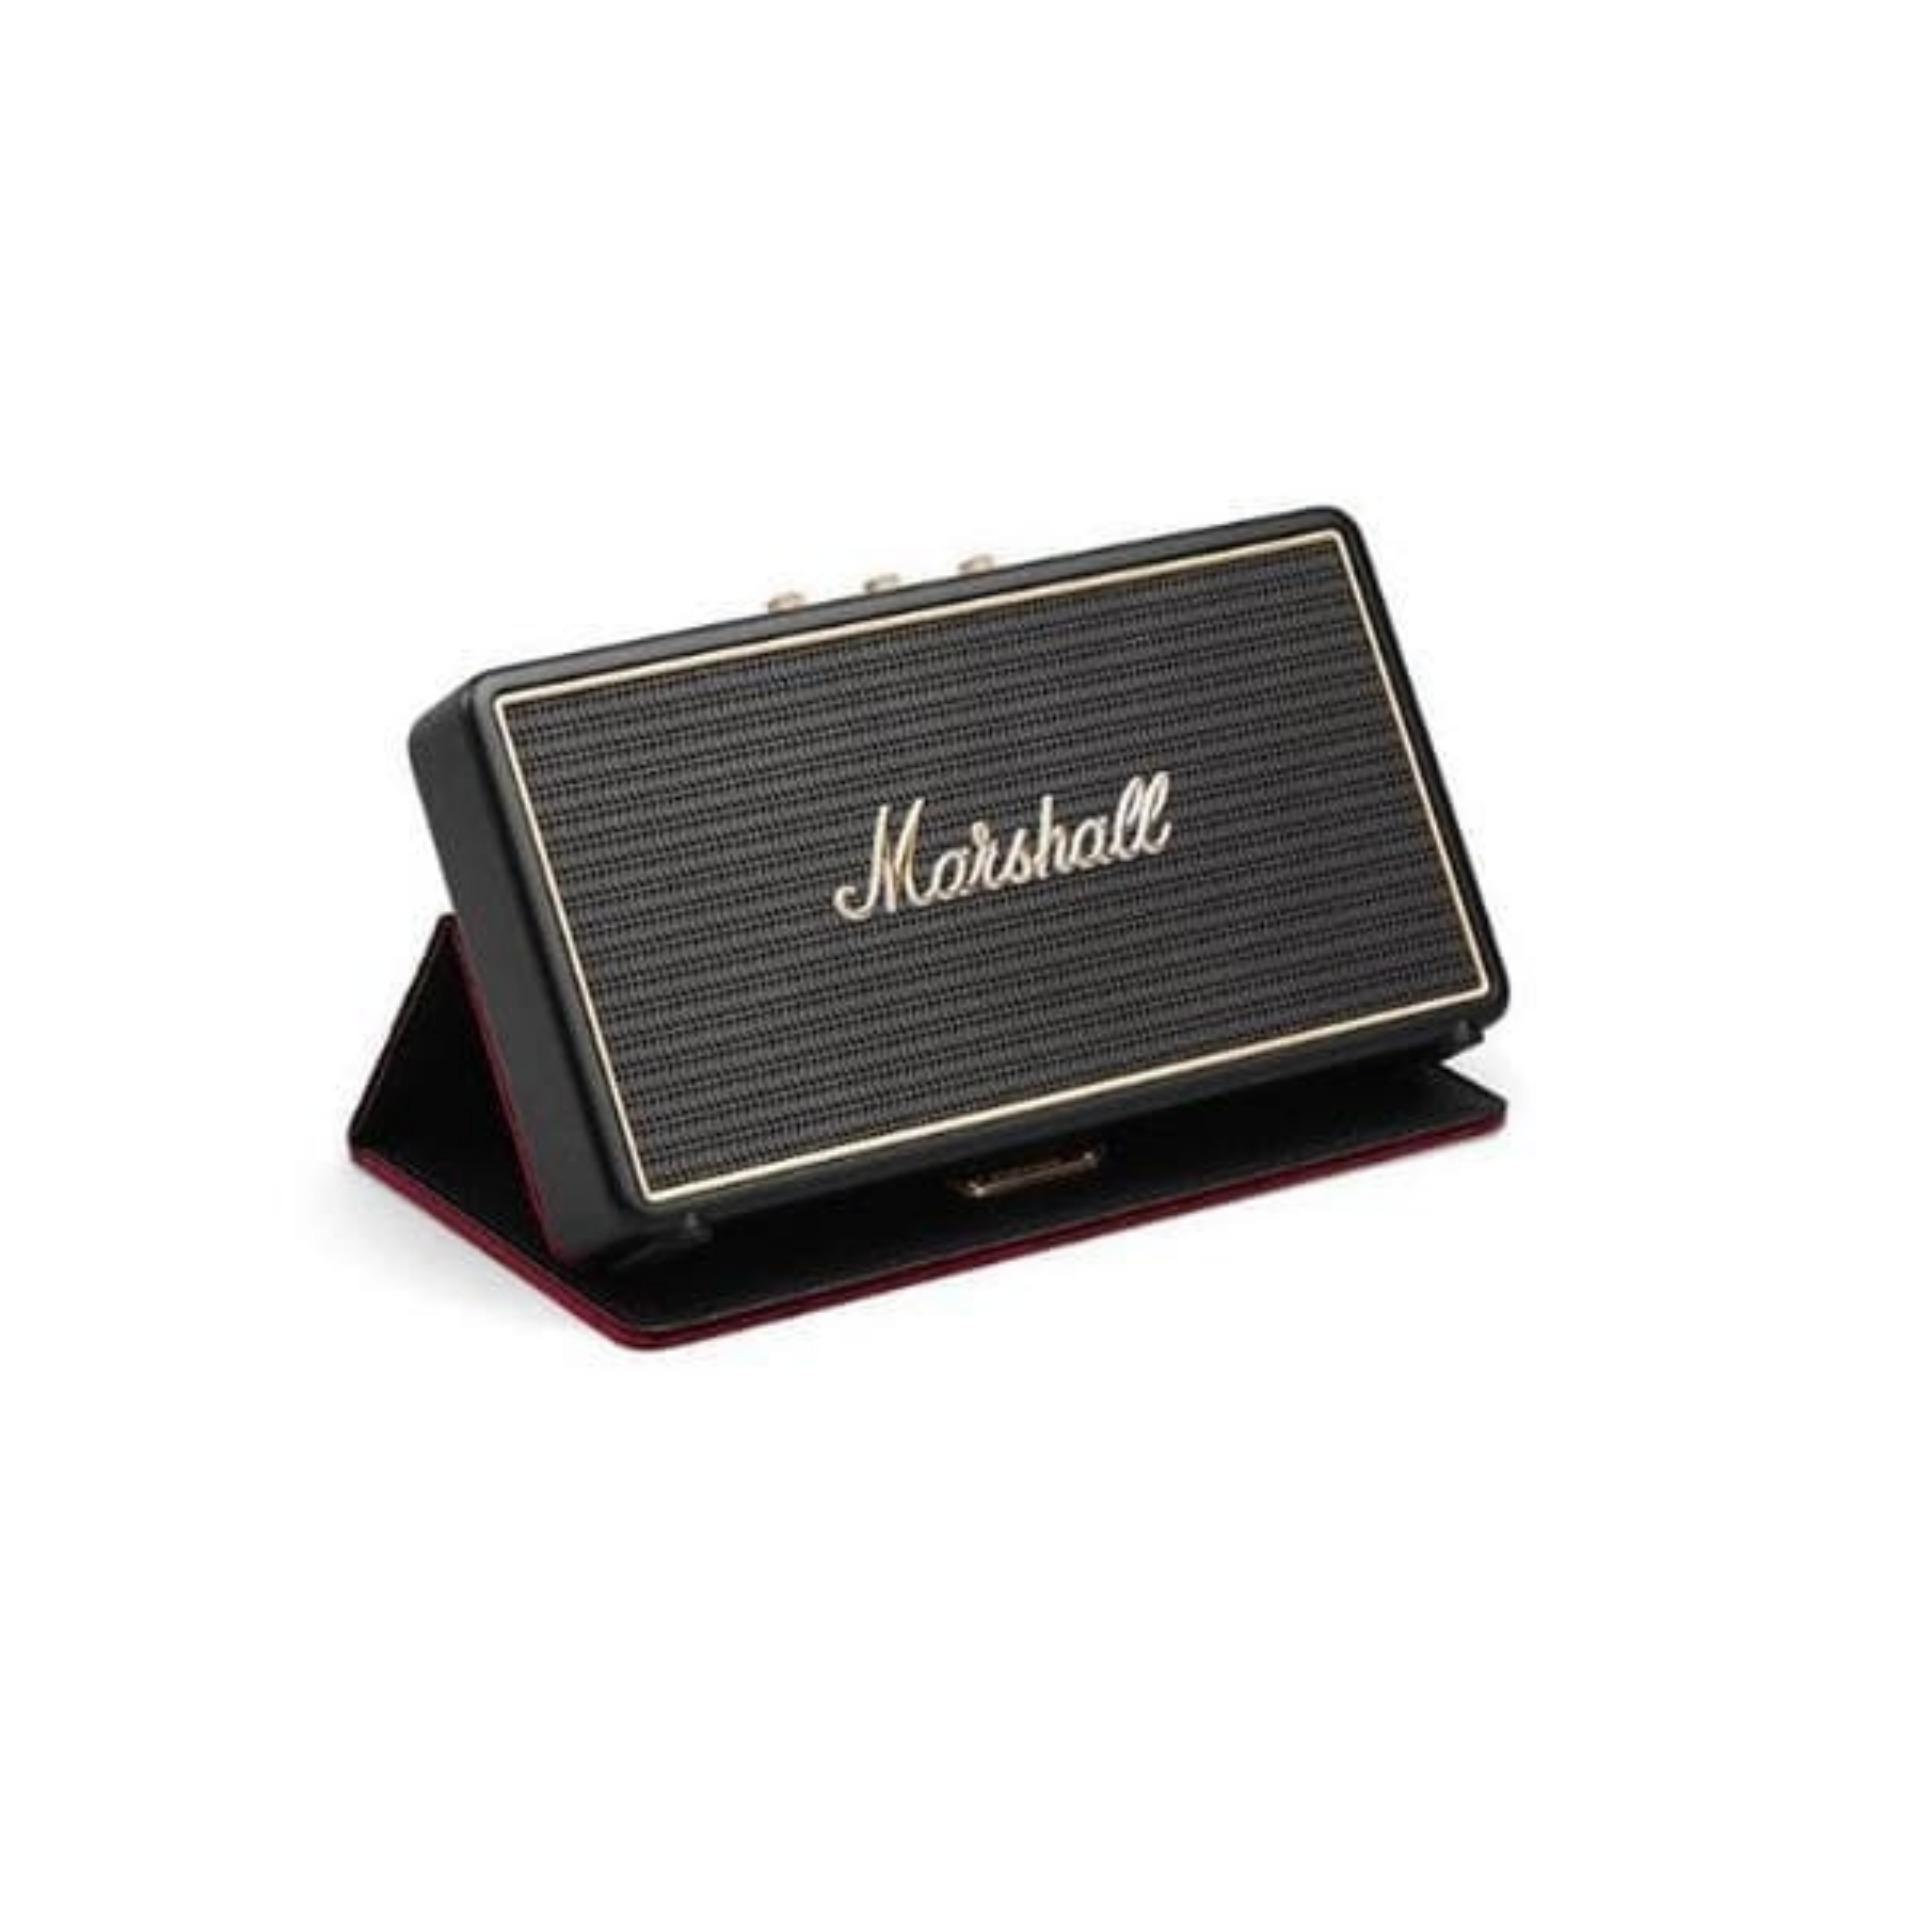 Robot Rb380 Bluetooth 30 Mini Hifi Speaker Black Update Daftar Rb430 Square De032 Source Marshall Stockwell